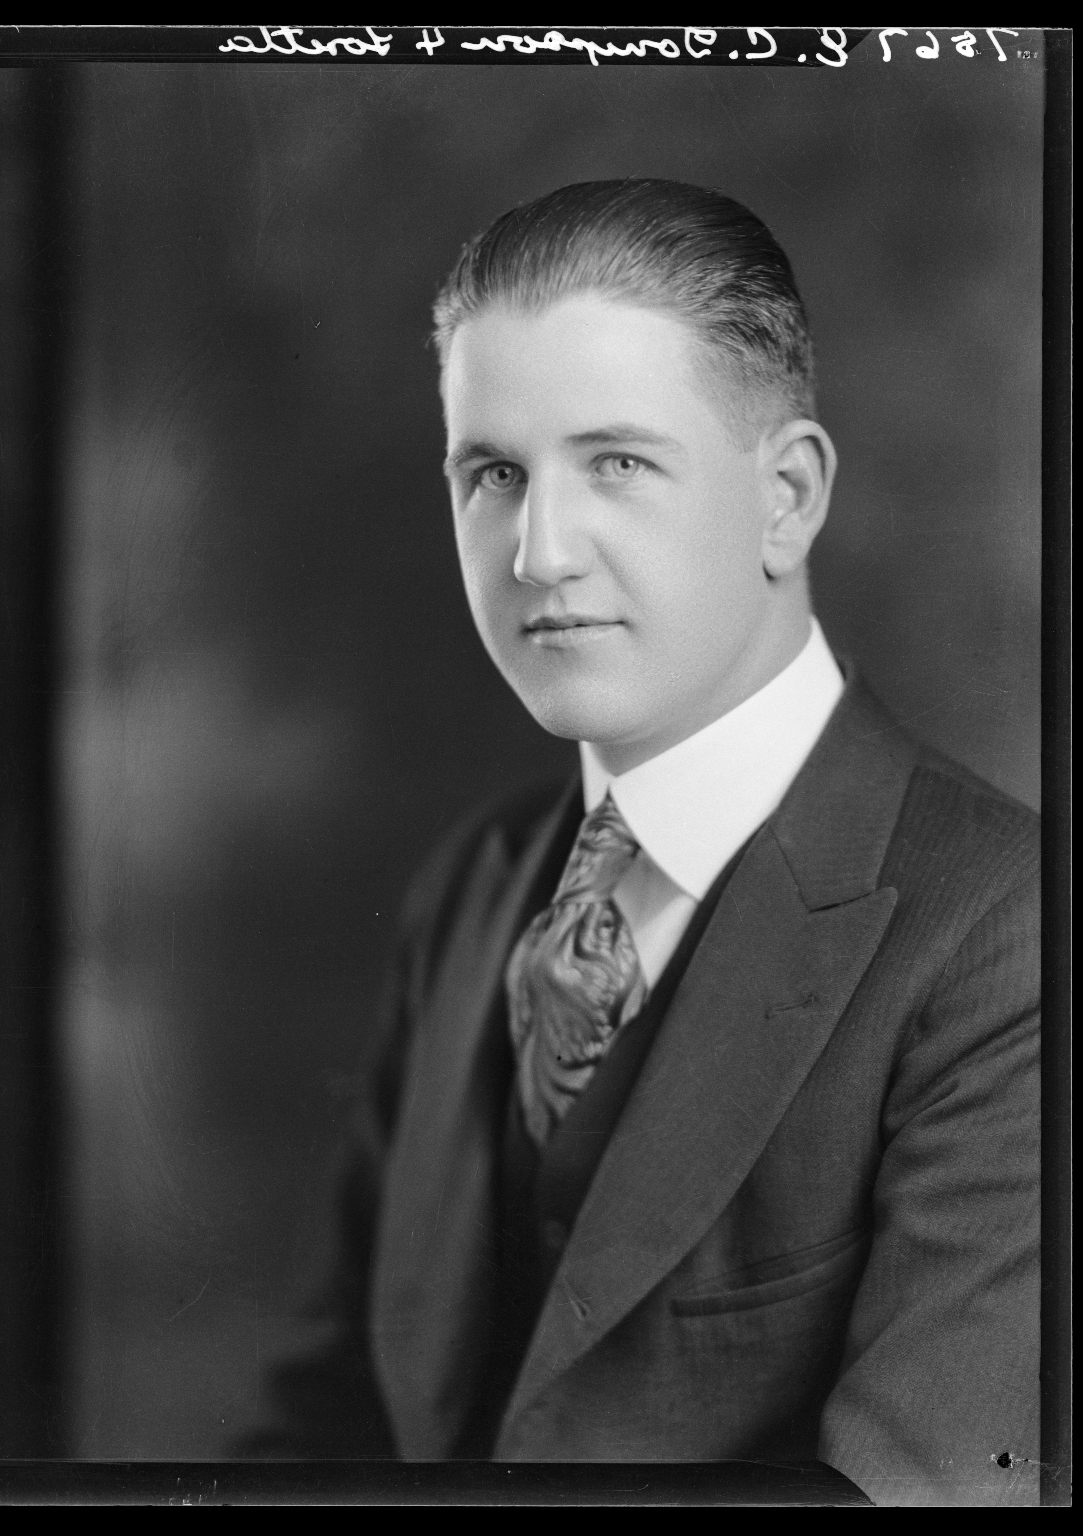 Portraits of E. C. Thompson